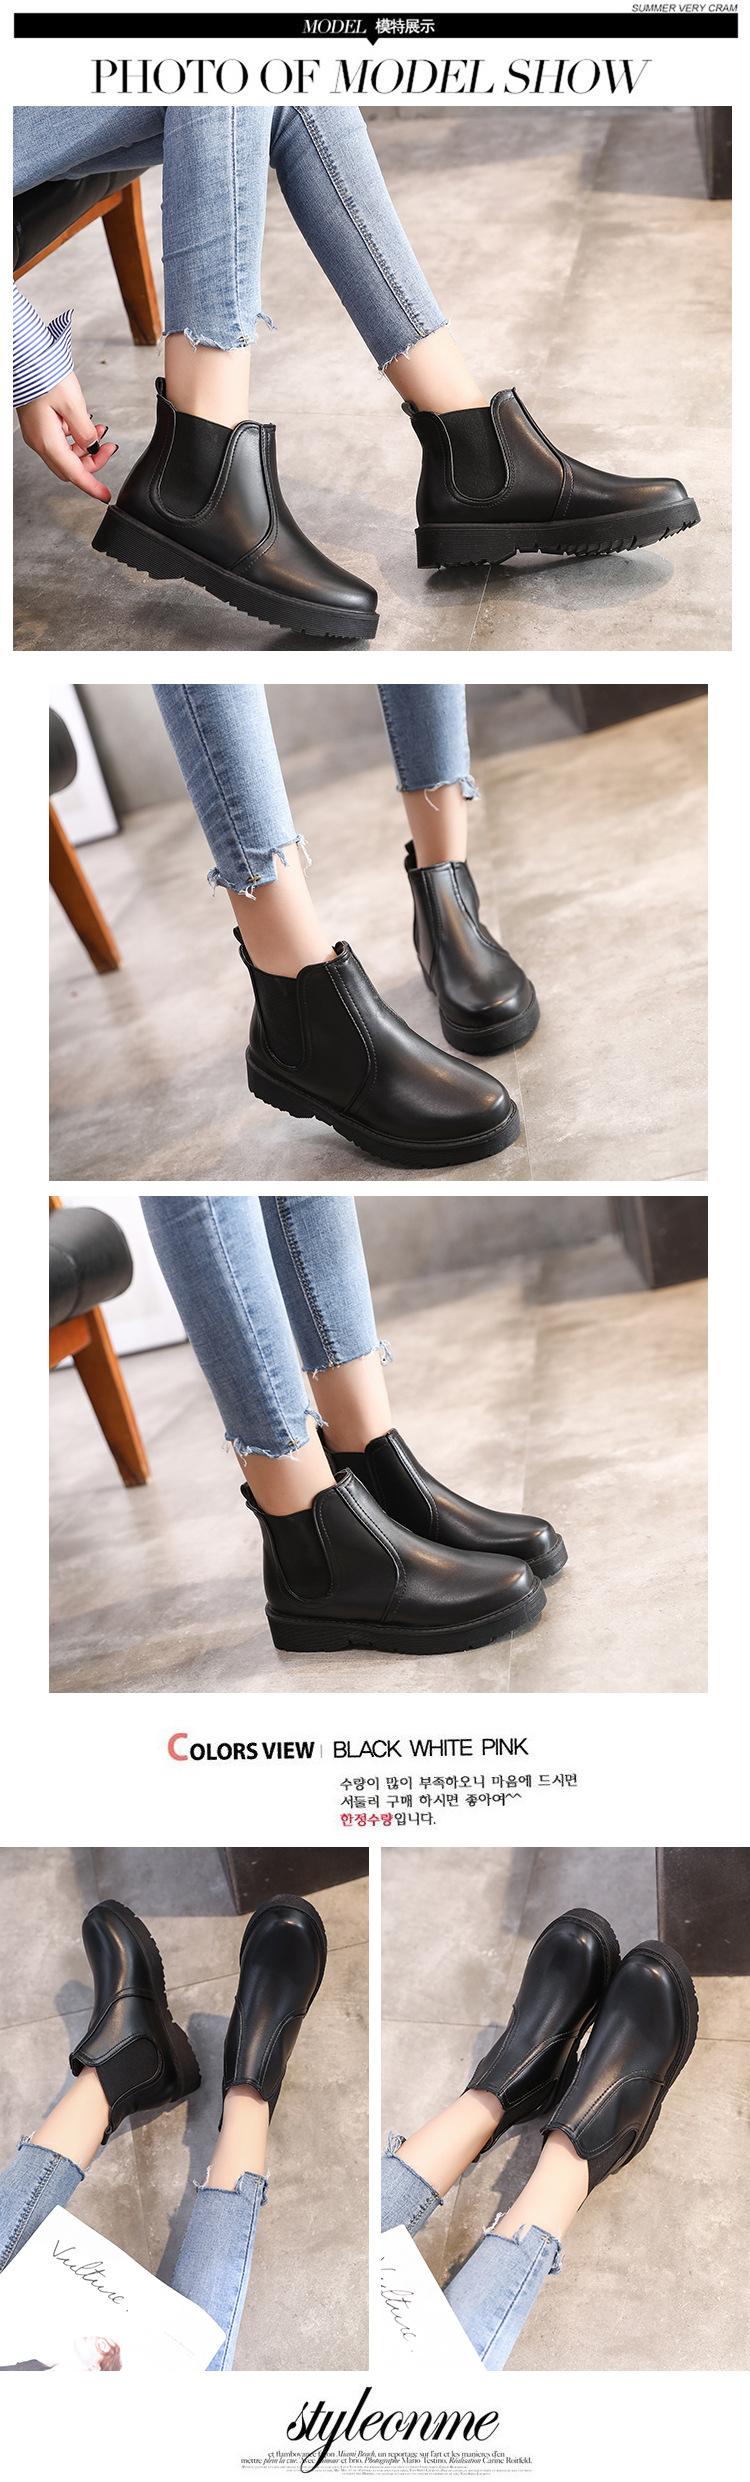 8ced562758 Women S Boots Fashion Wild Martin Boots Female Round Head Low Heel ...